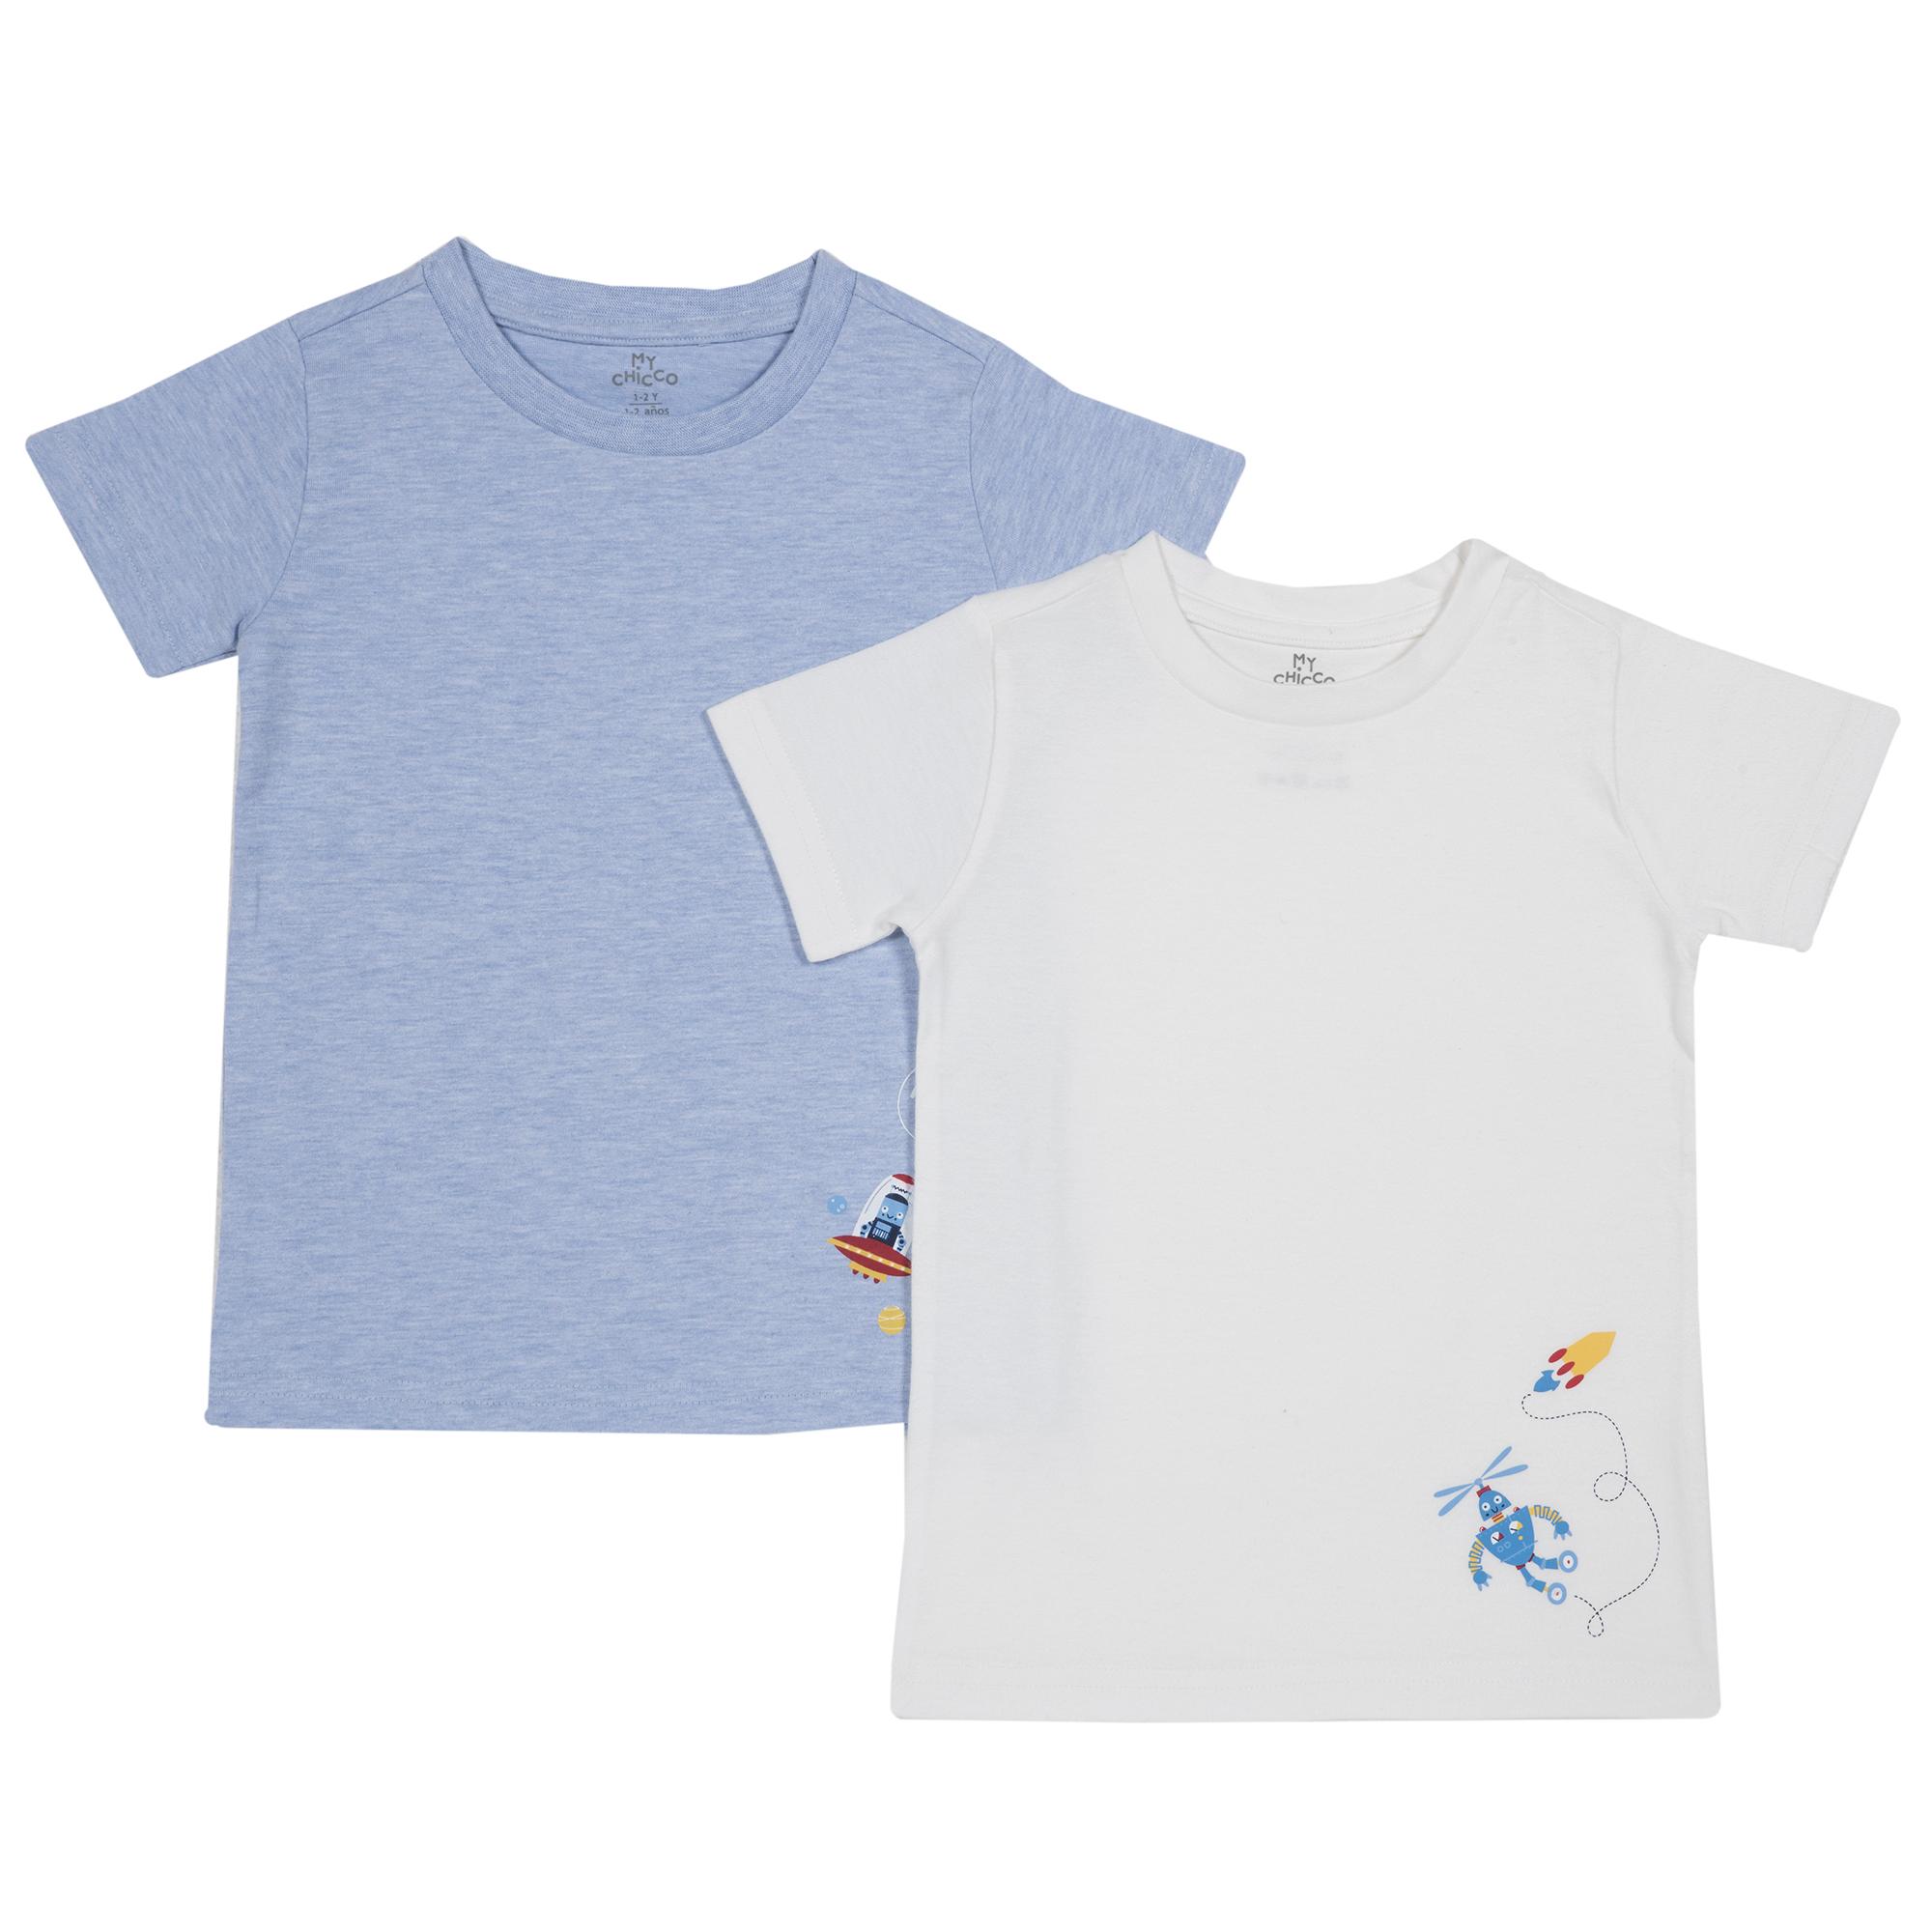 Set Doua Tricouri Copii Chicco, Albastru Si Alb imagine